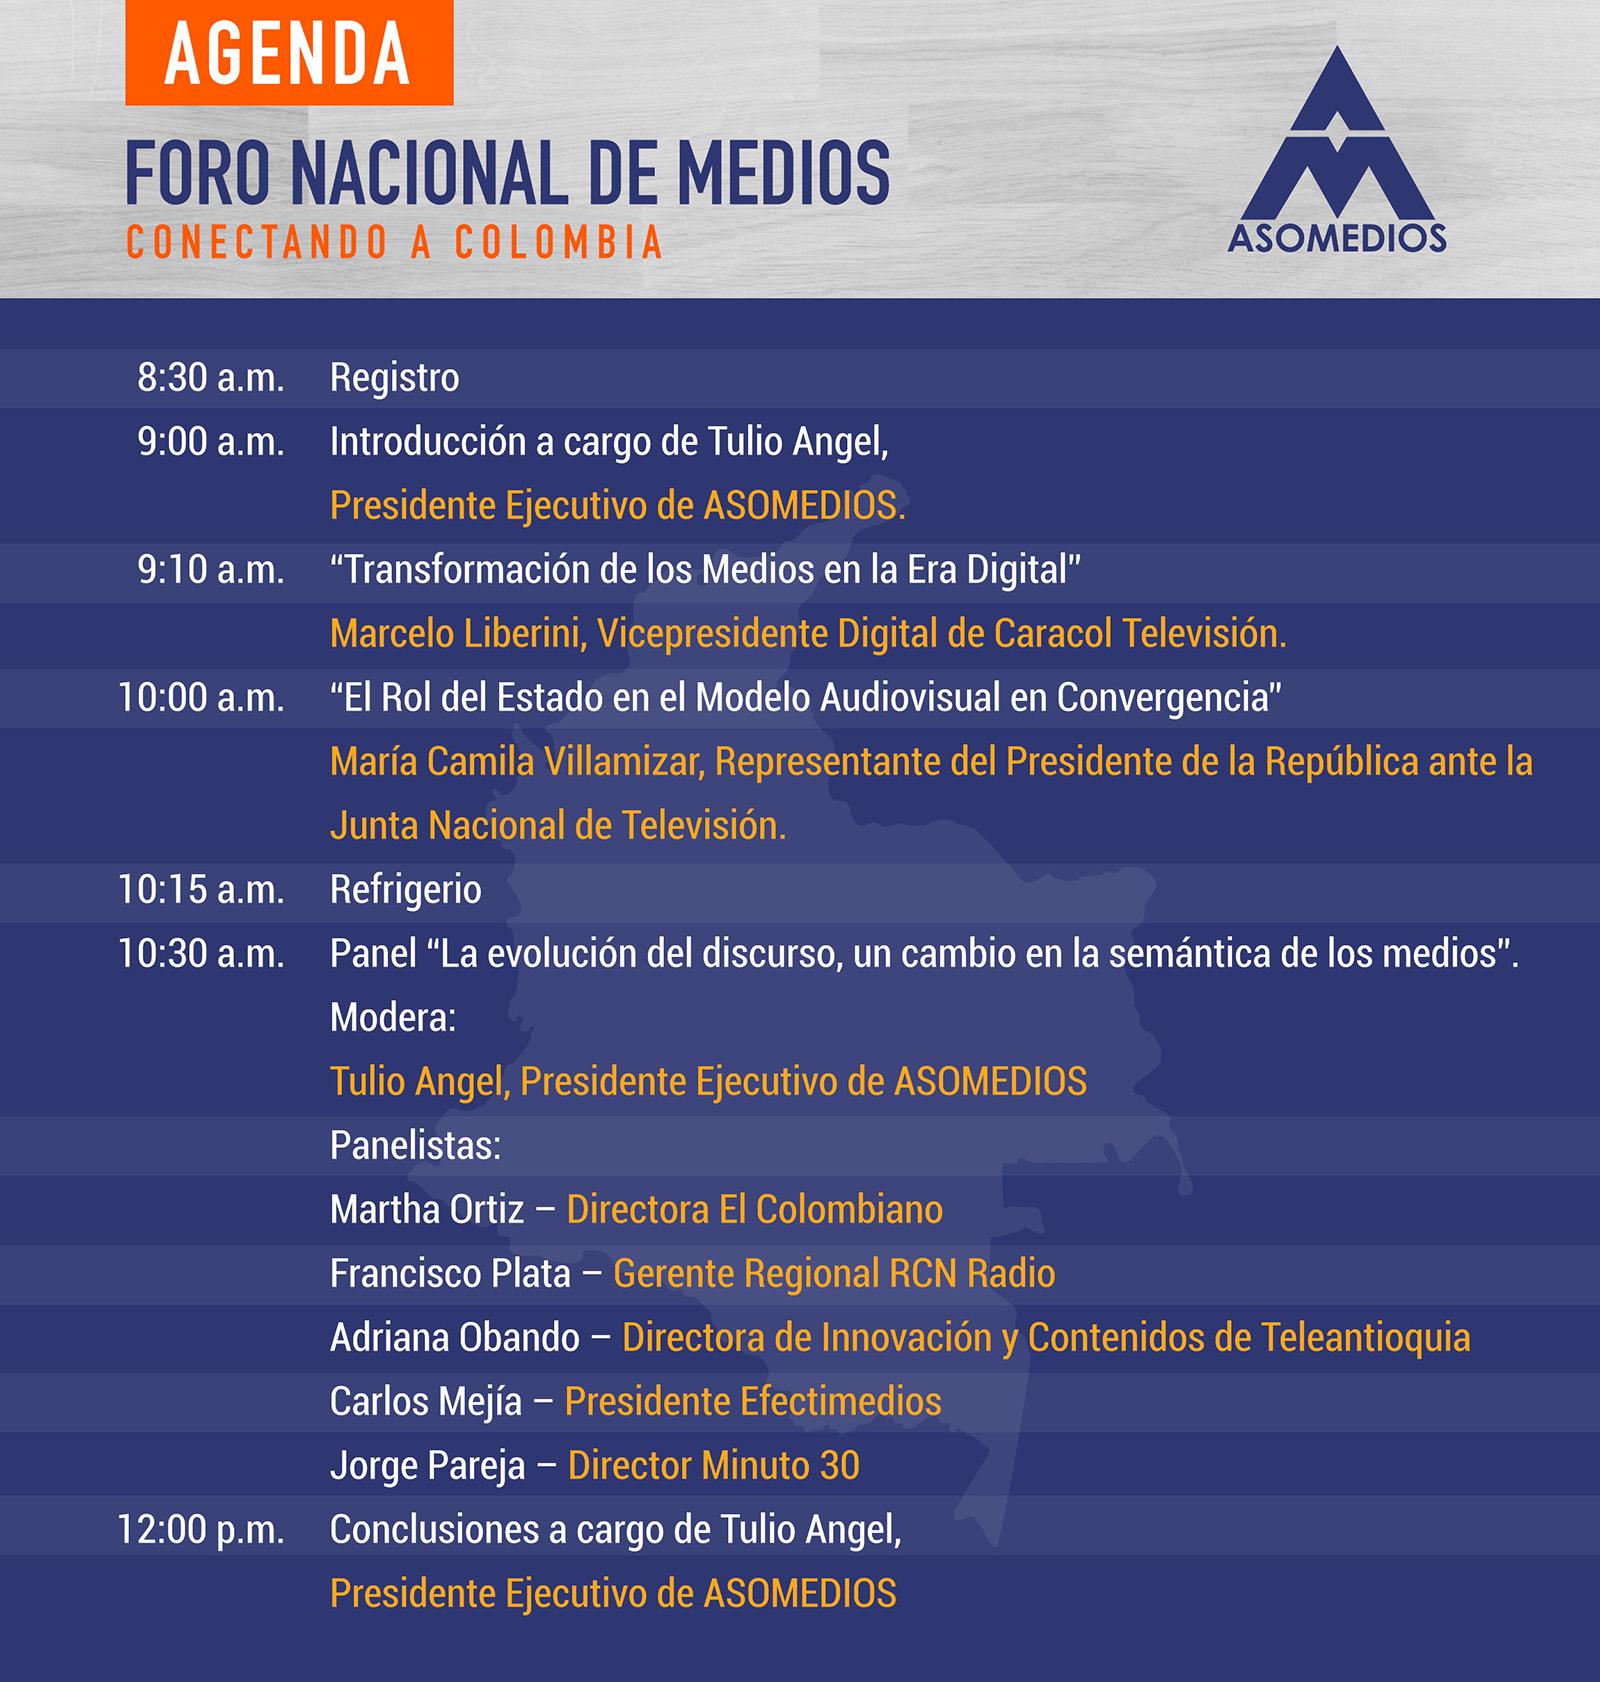 ANGENDA GENERAL ASOMEDIOS FORO NACIONAL DE MEDIOS CONECTANDO A COLOMBIA